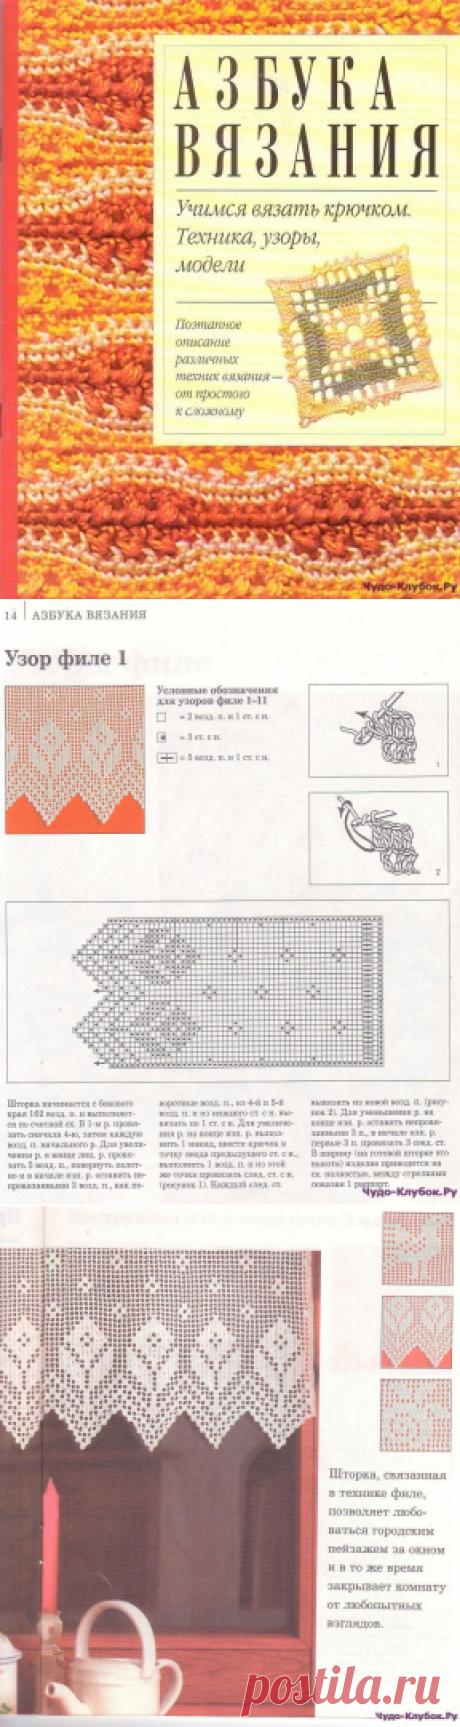 Азбука вязания | ЧУДО-КЛУБОК.РУ